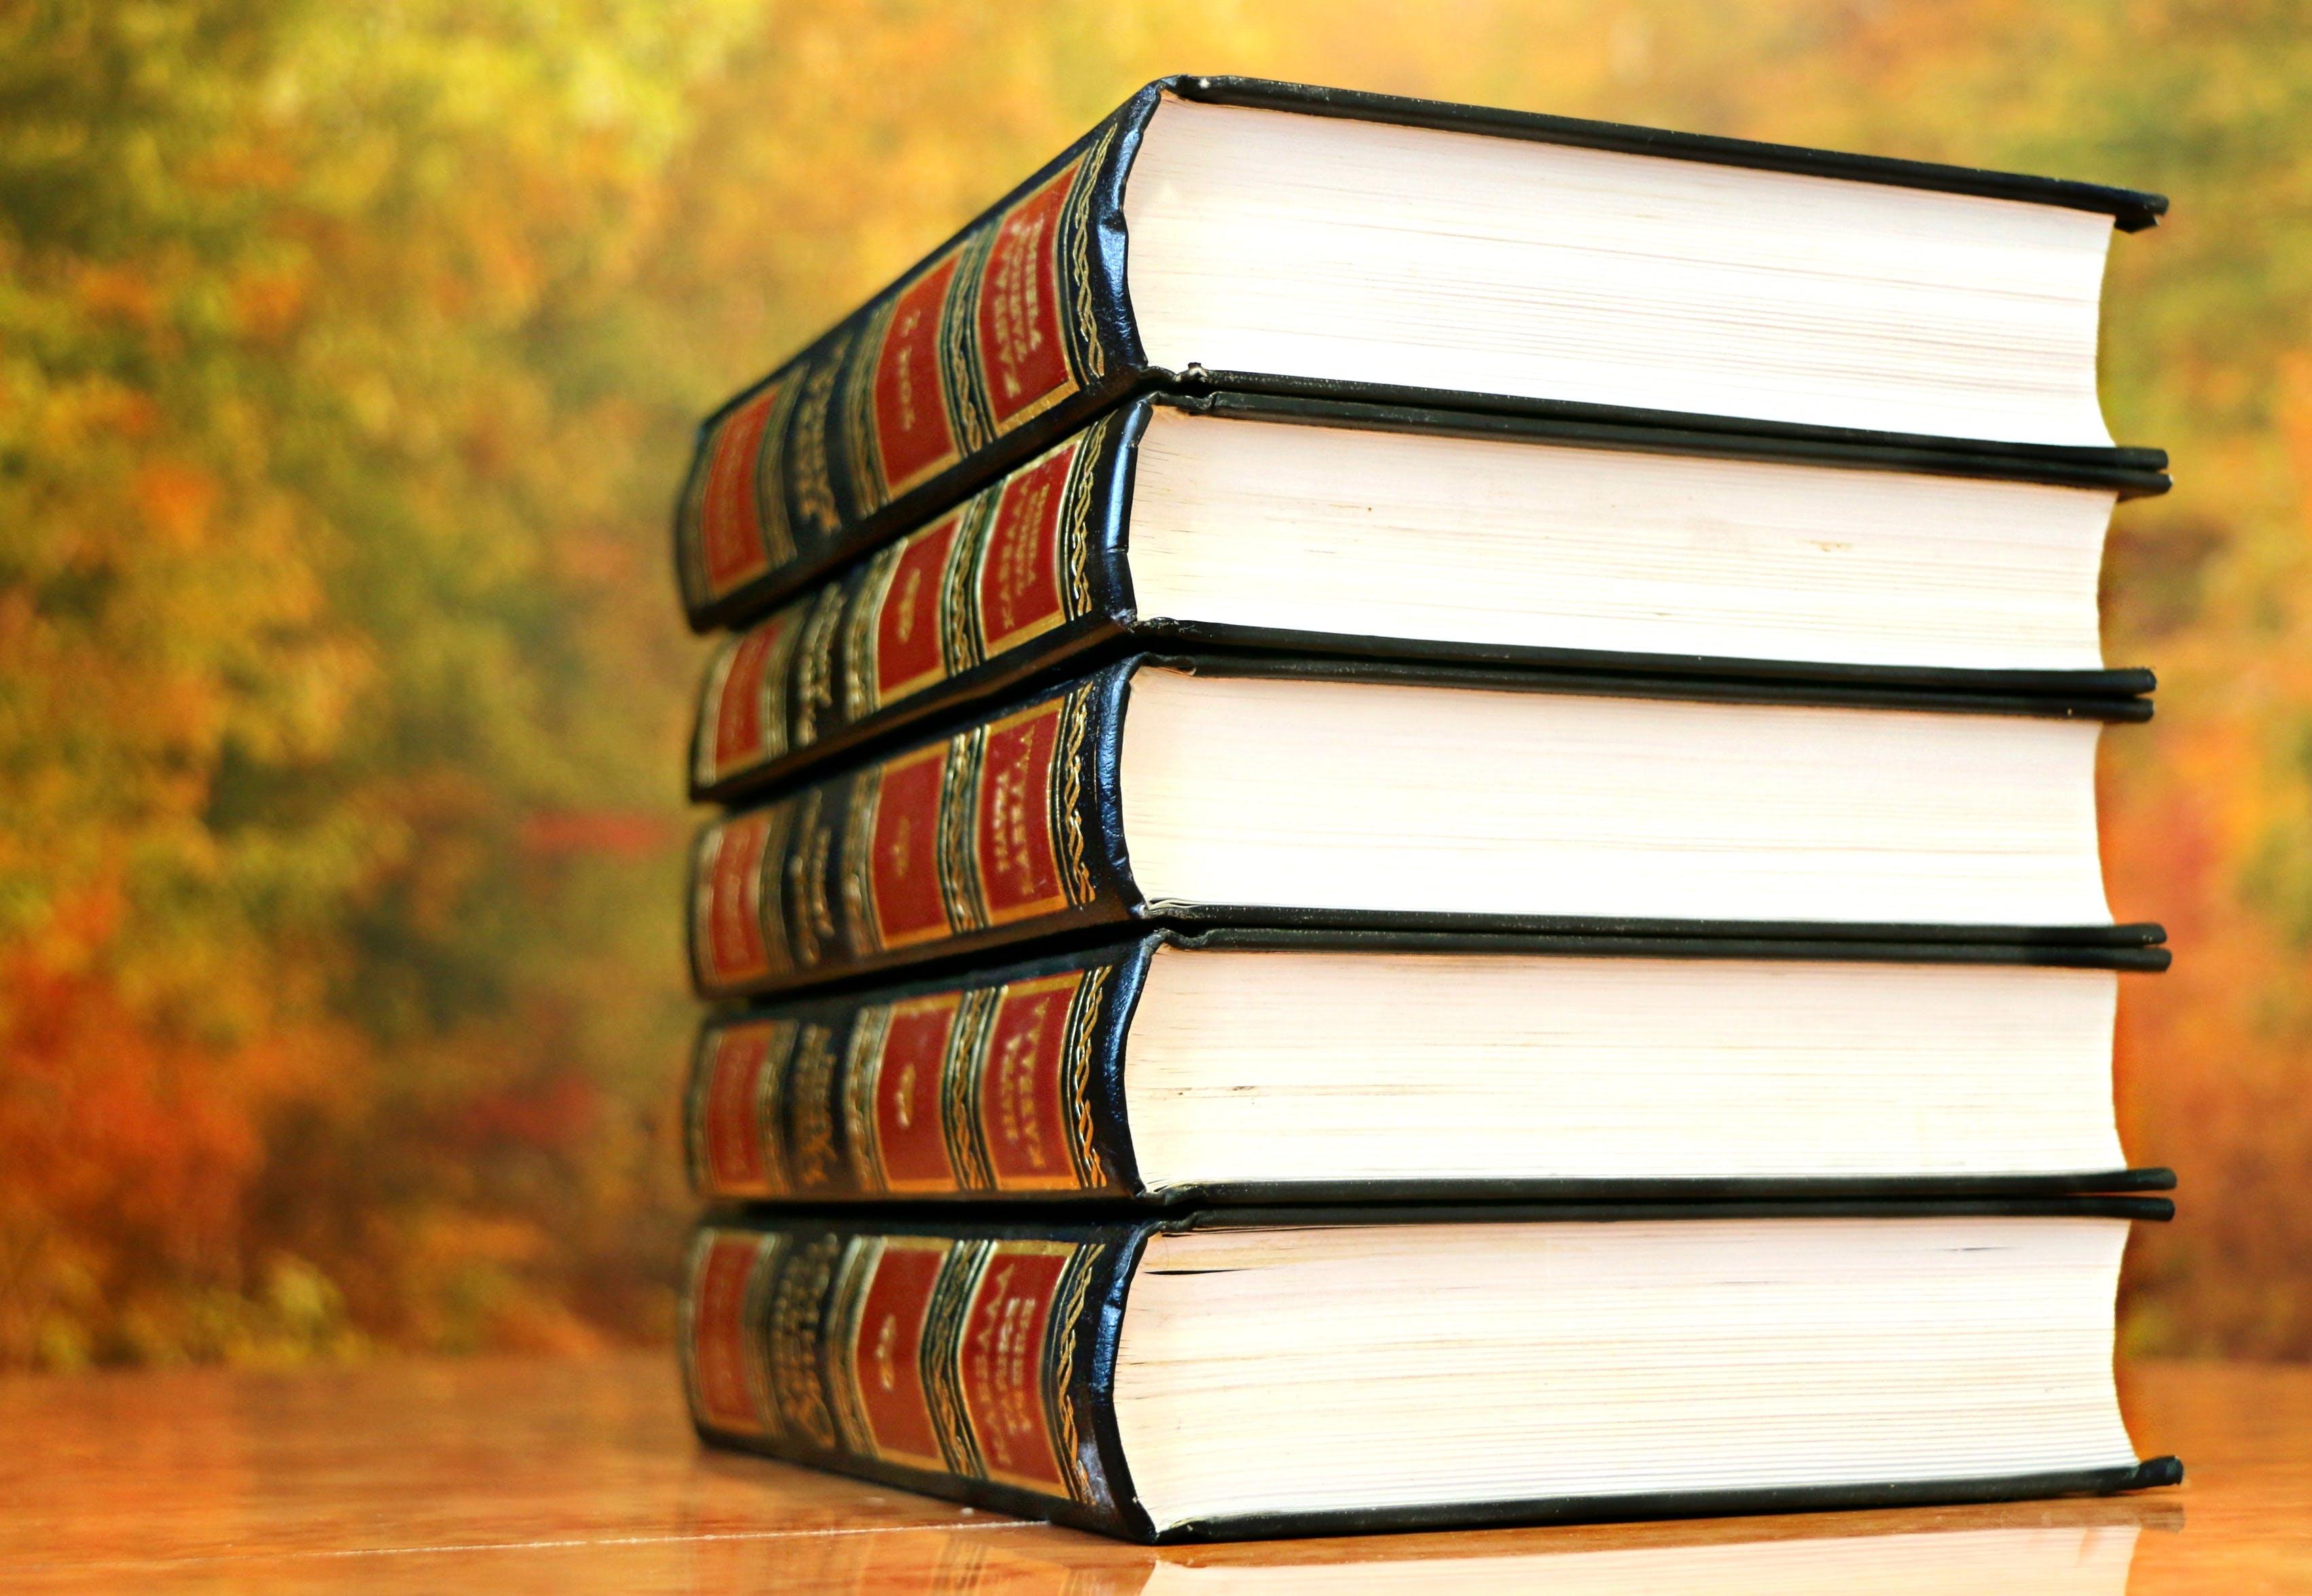 Five Hardbound Books on Brown Surface